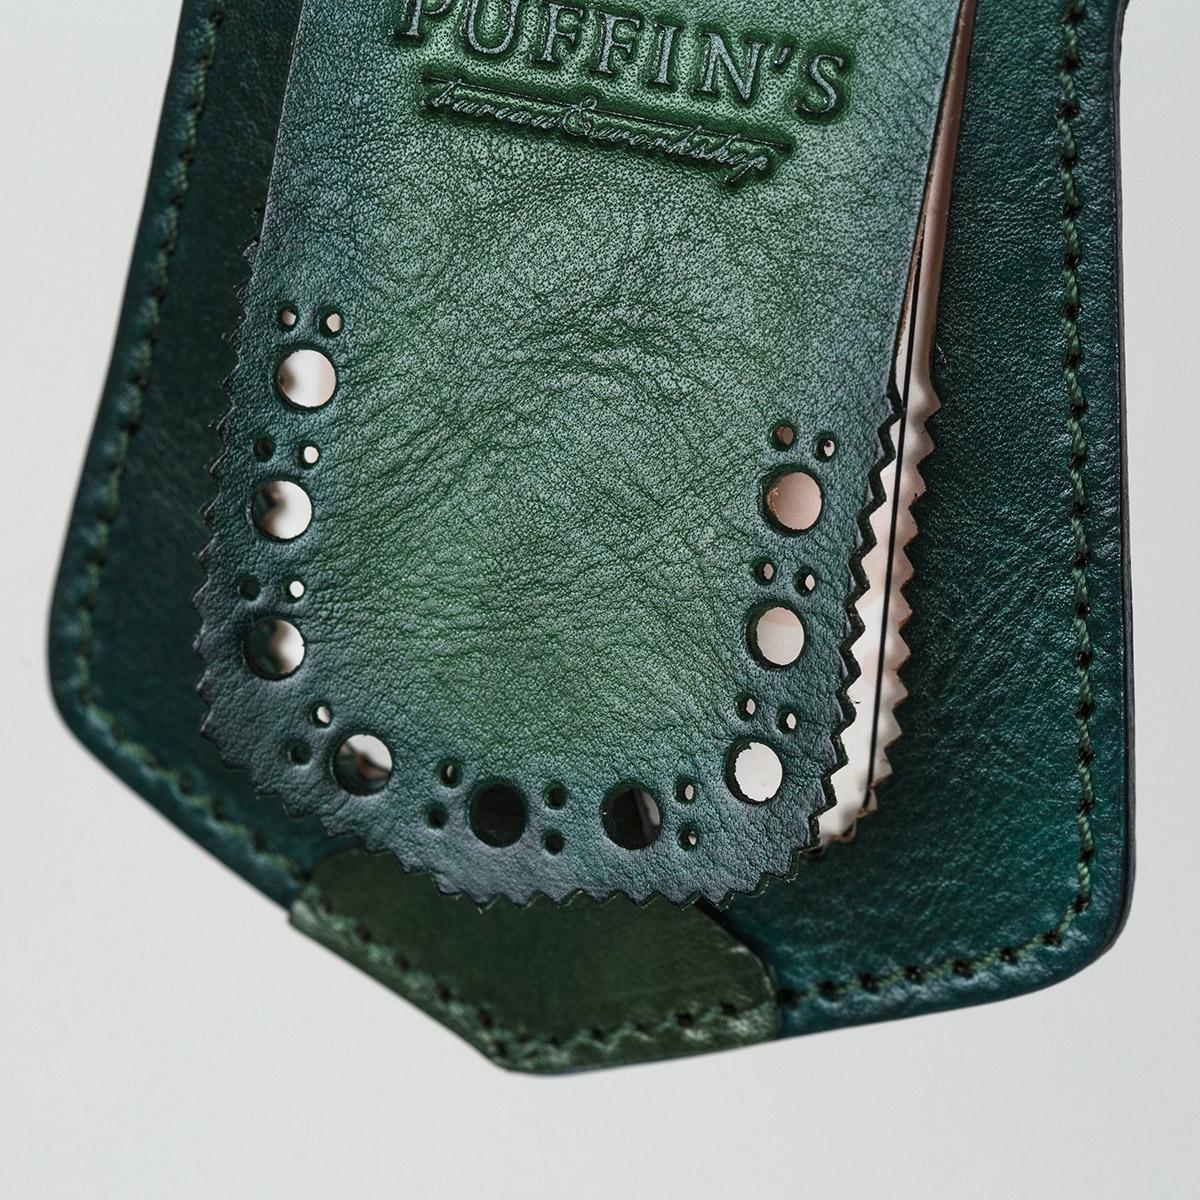 Luggage tag TAVARUA personalized with patina grassy green